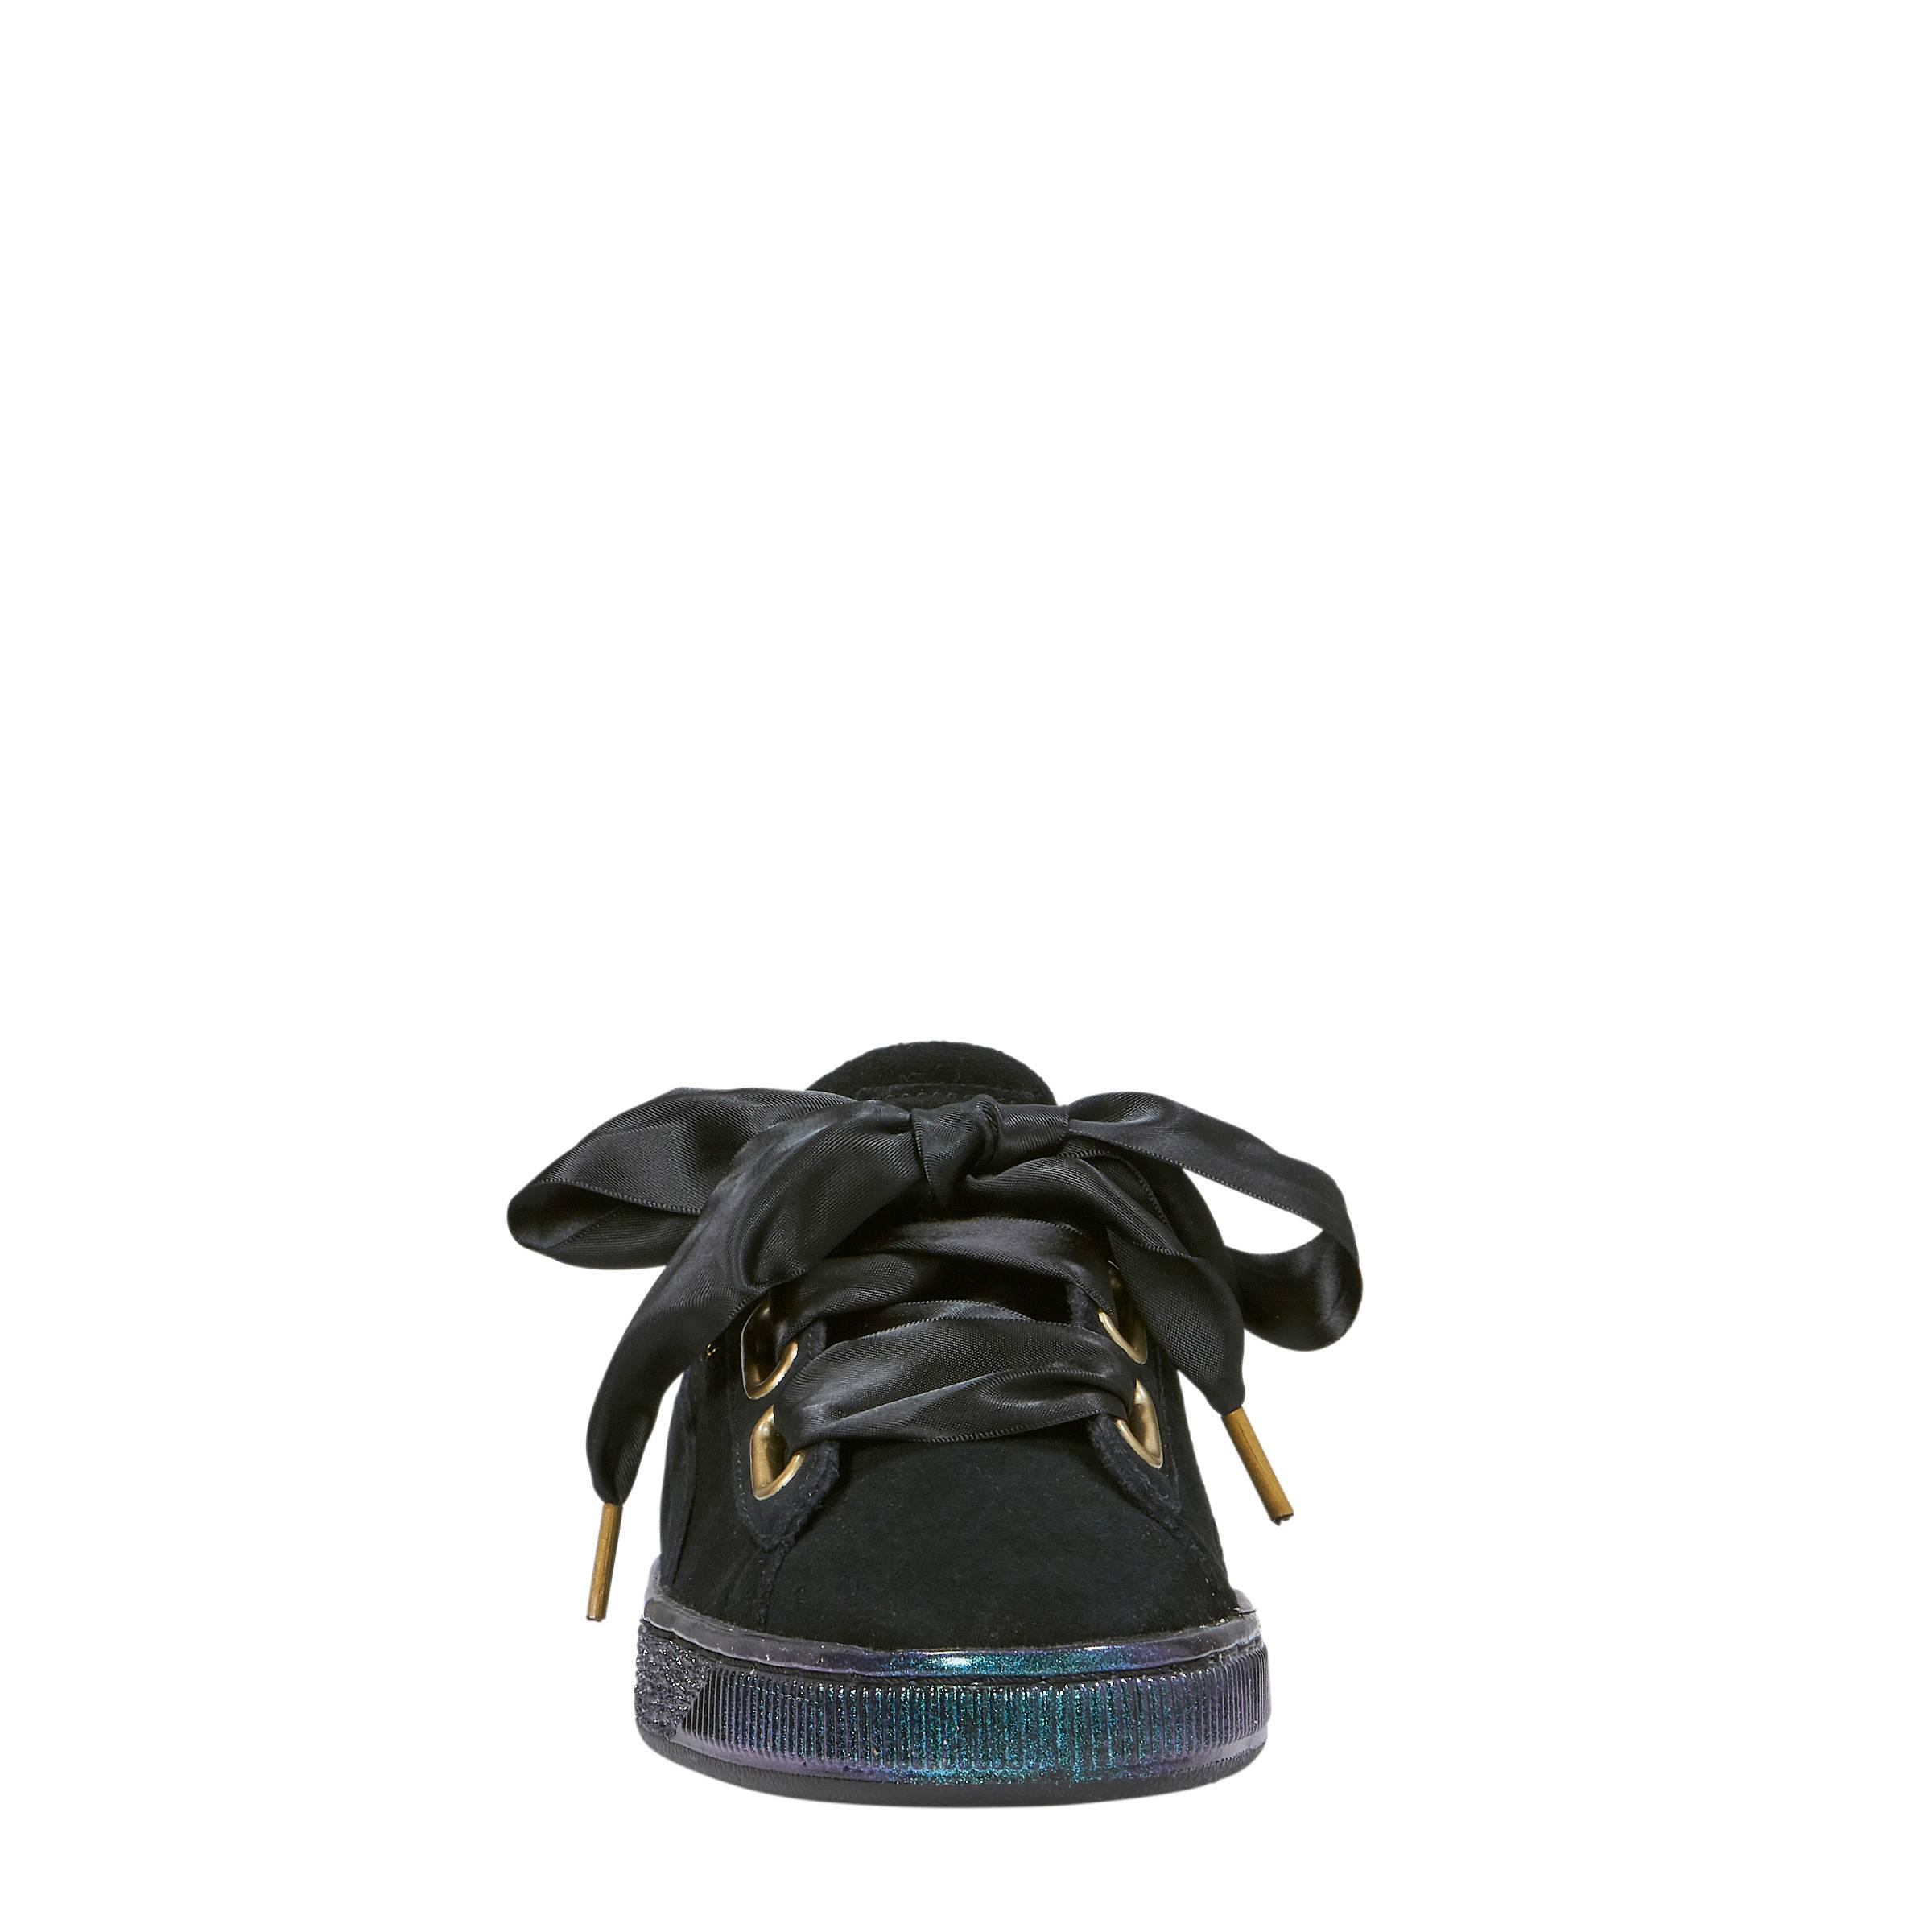 c6f396b8565 Puma Suede Heart Satin Wn's sneakers | wehkamp